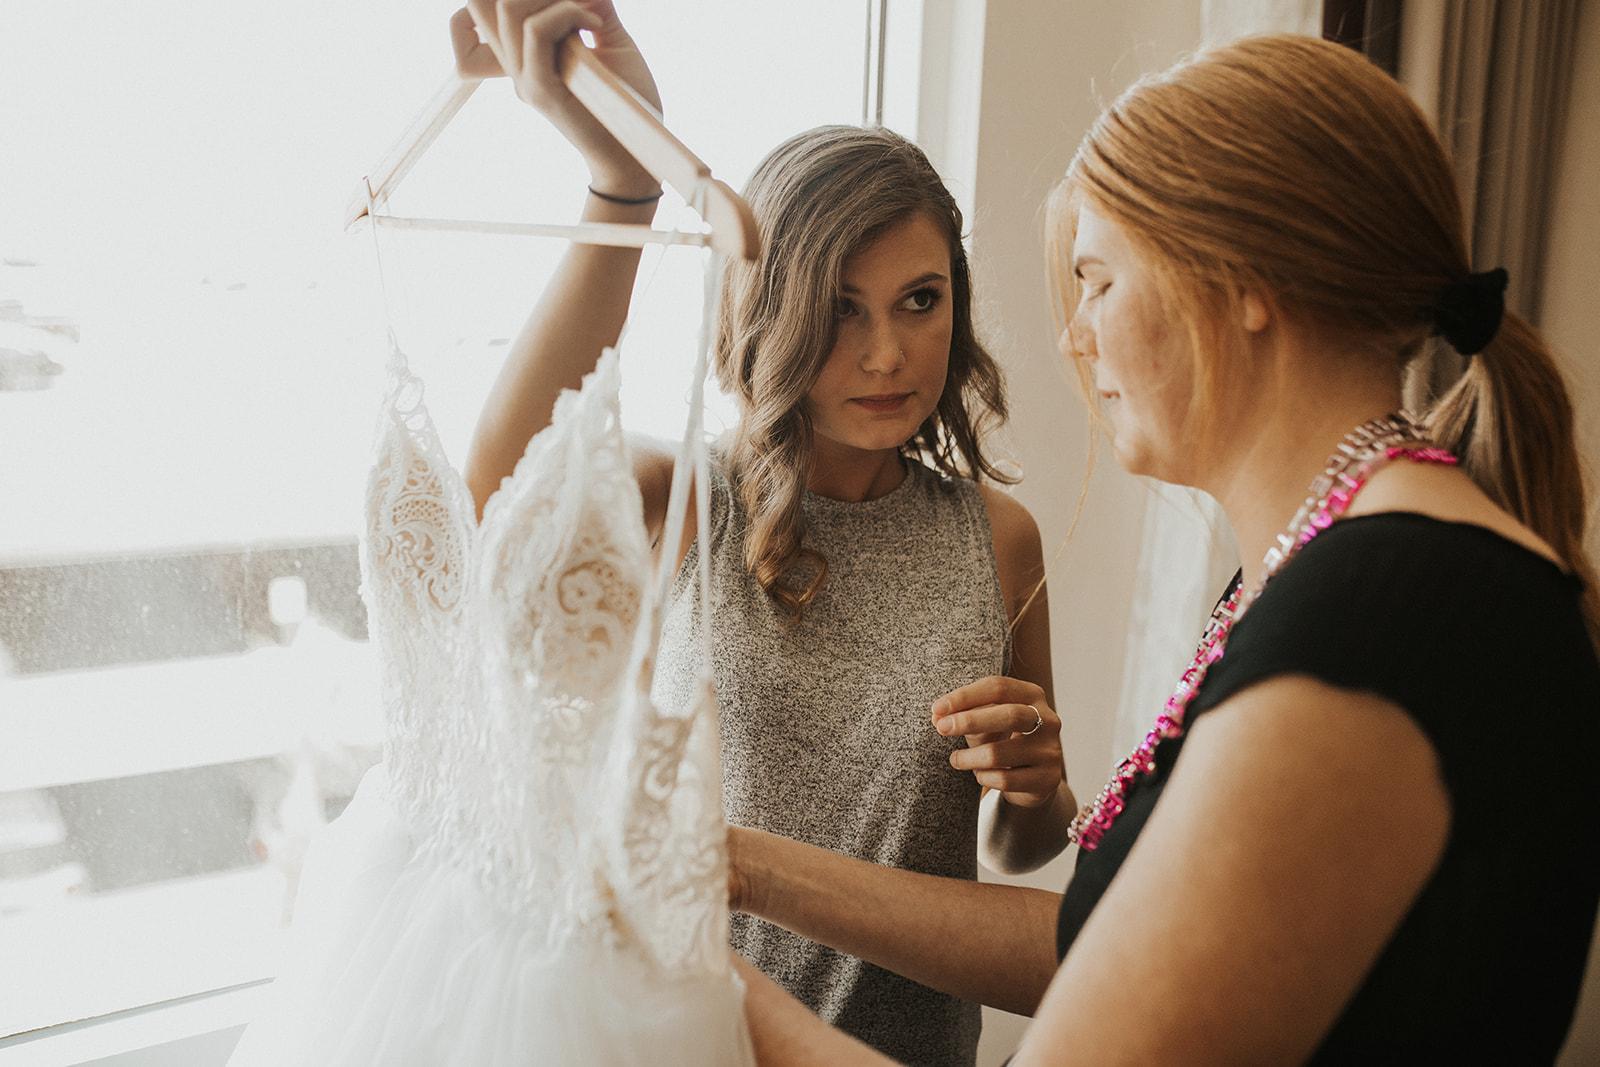 wedding dress spokane bride getting ready